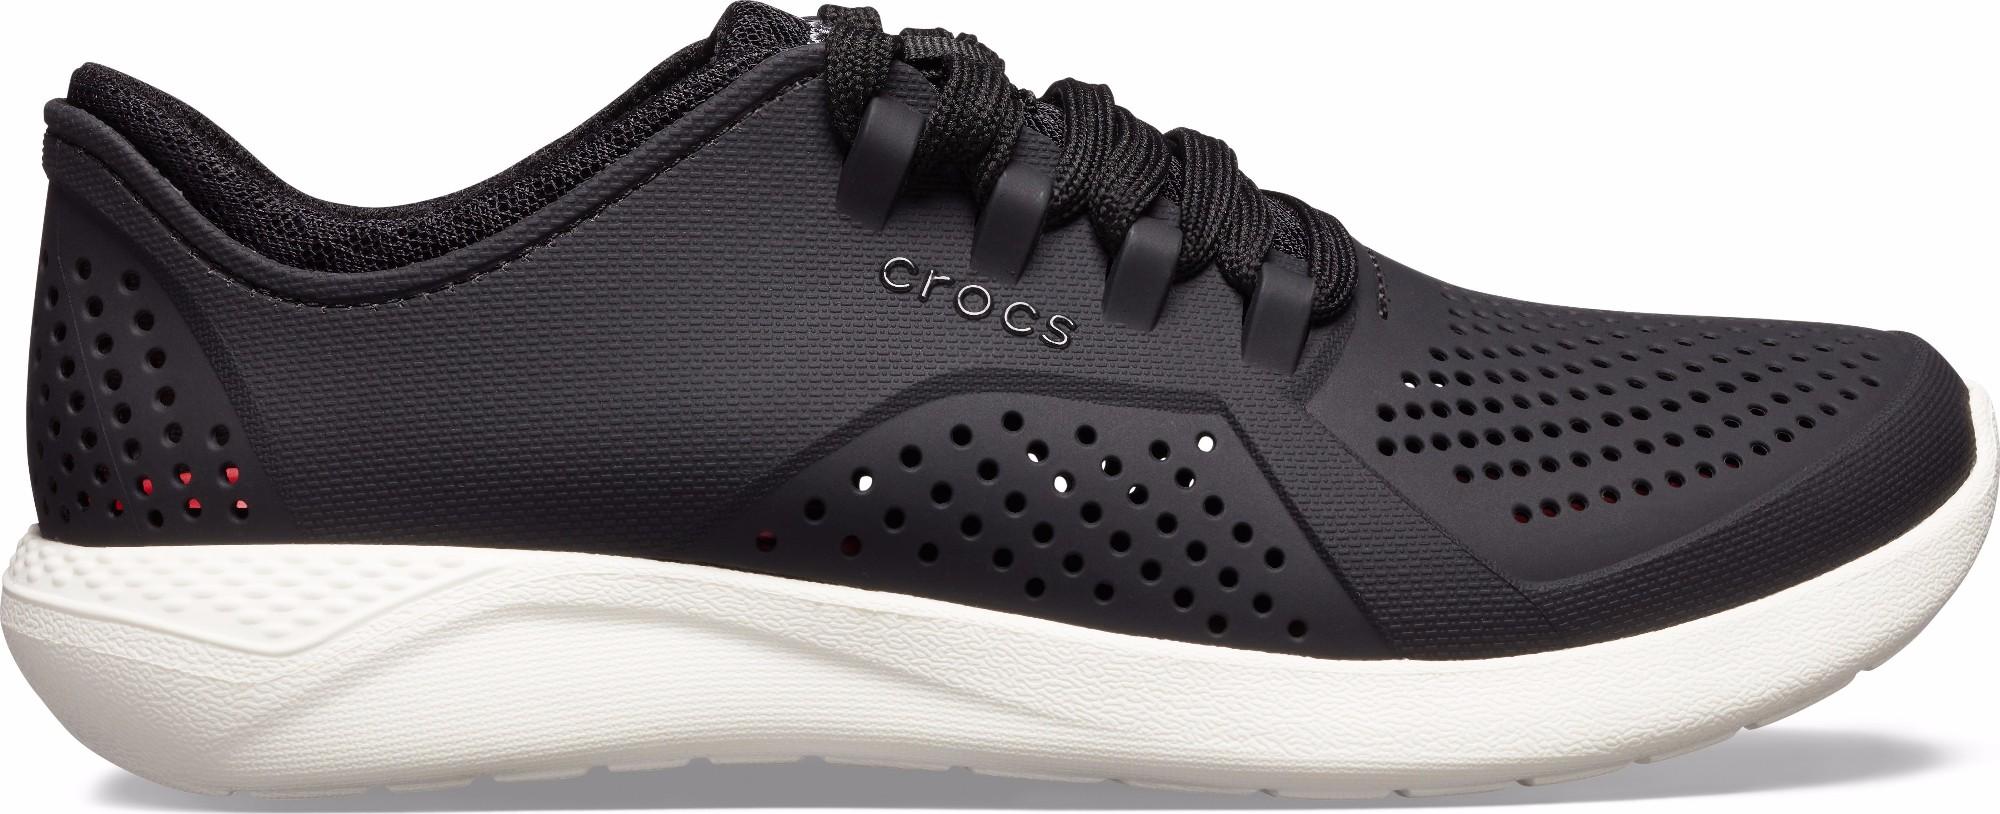 crocs Isabella Clog Women, Damen Clogs, Schwarz (Black), 39/40 EU